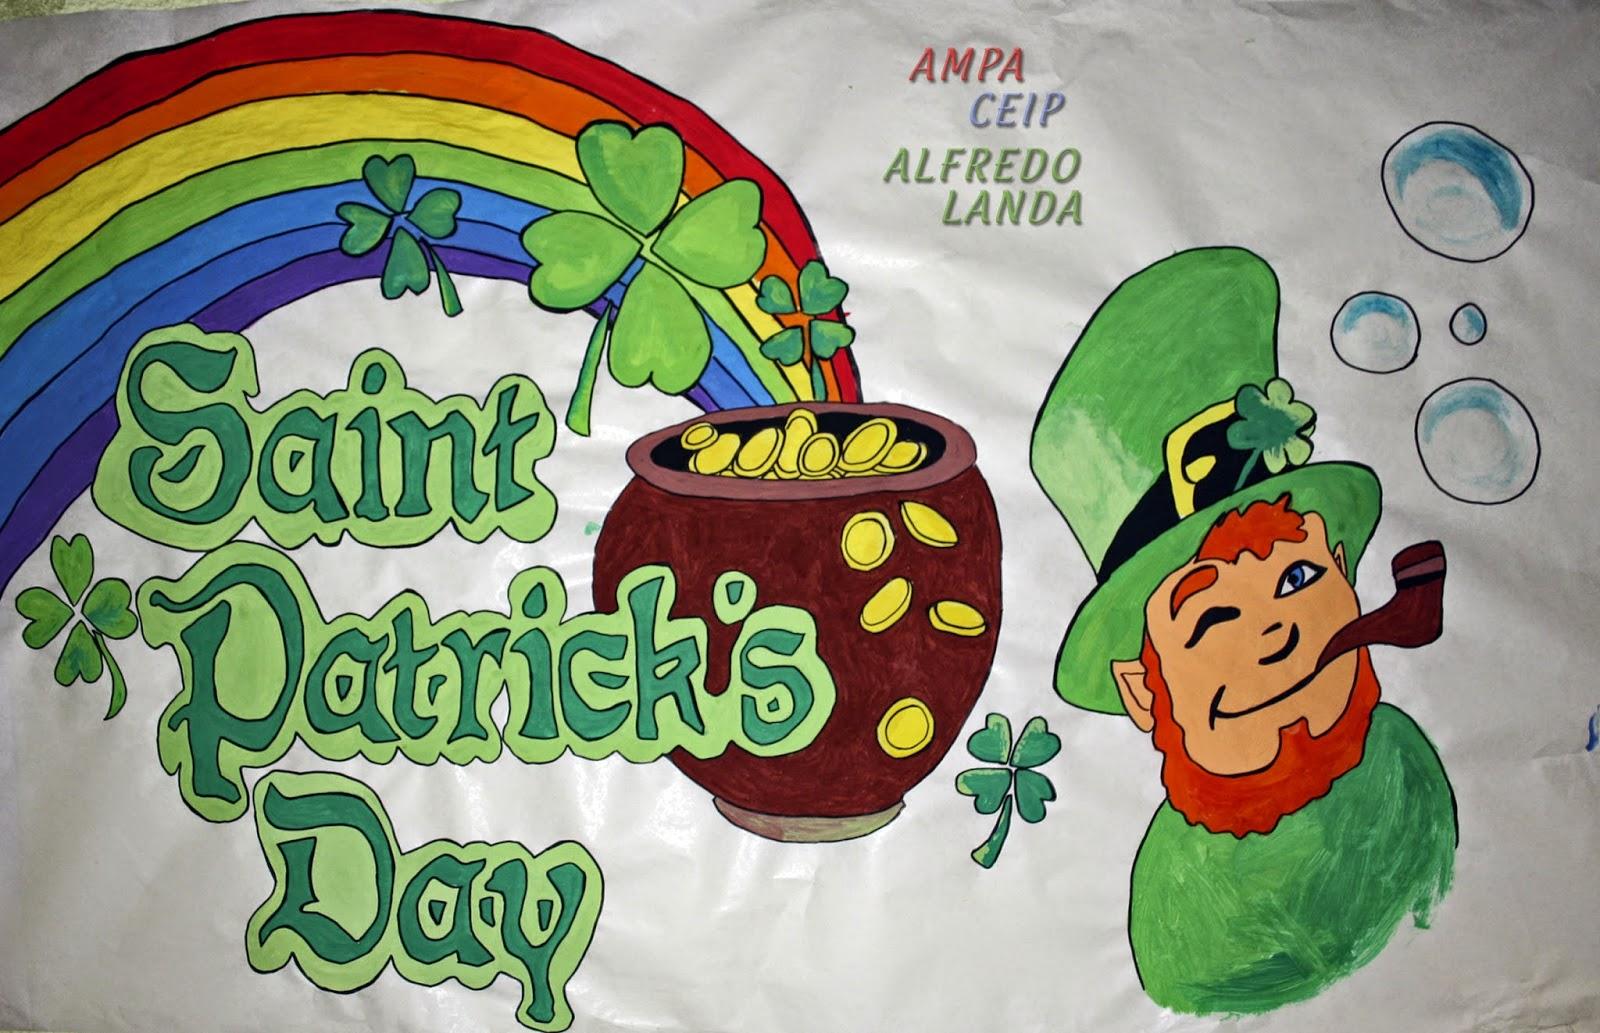 Ampa Ceip Alfredo Landa: Saint Patrick\'s Day!